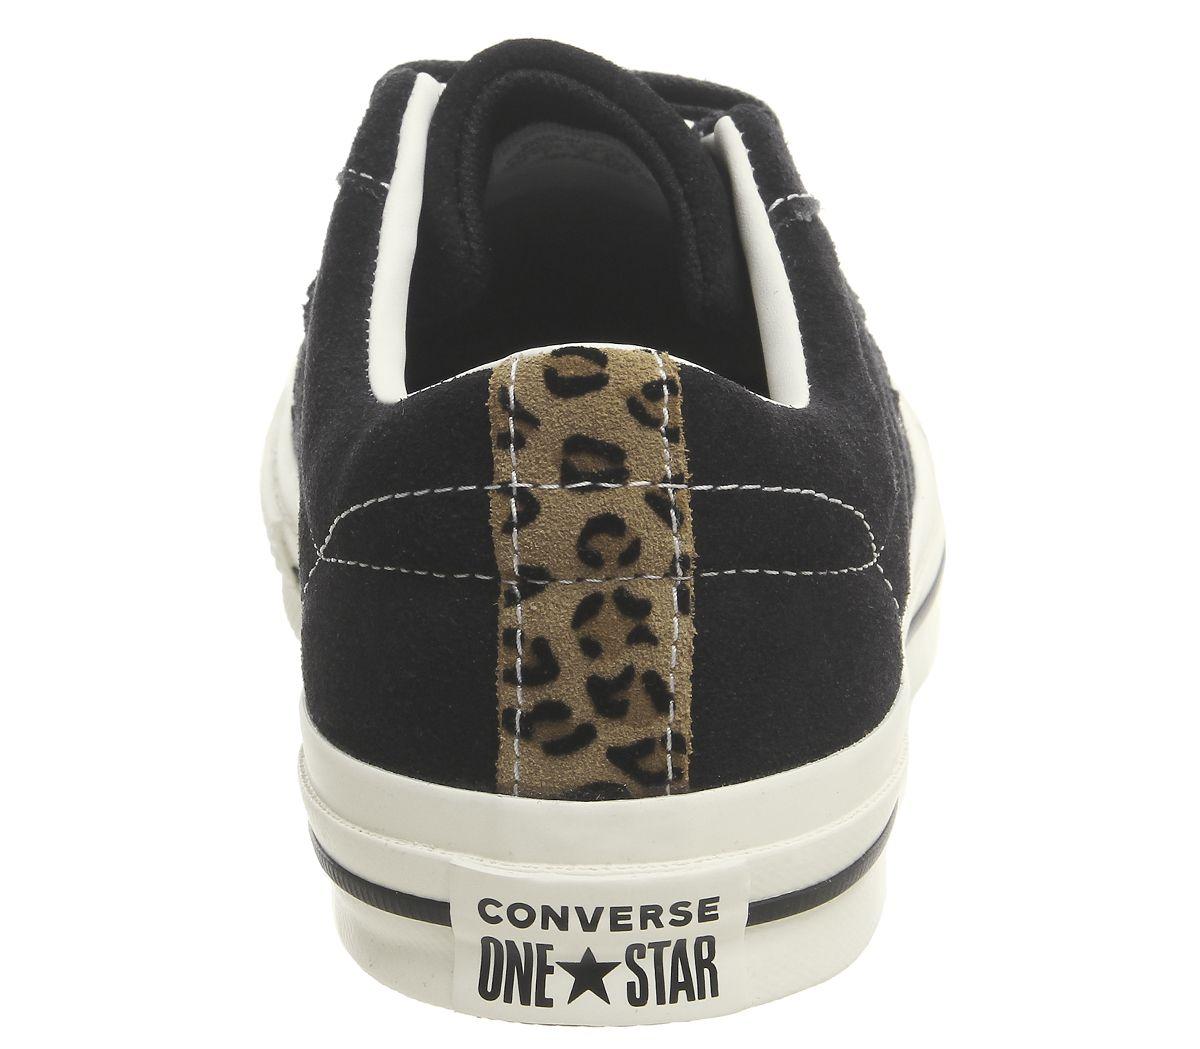 ea6ca1b6d6edd7 Sentinel Womens Converse One Star Trainers Black Egret Leopard Exclusive Trainers  Shoes